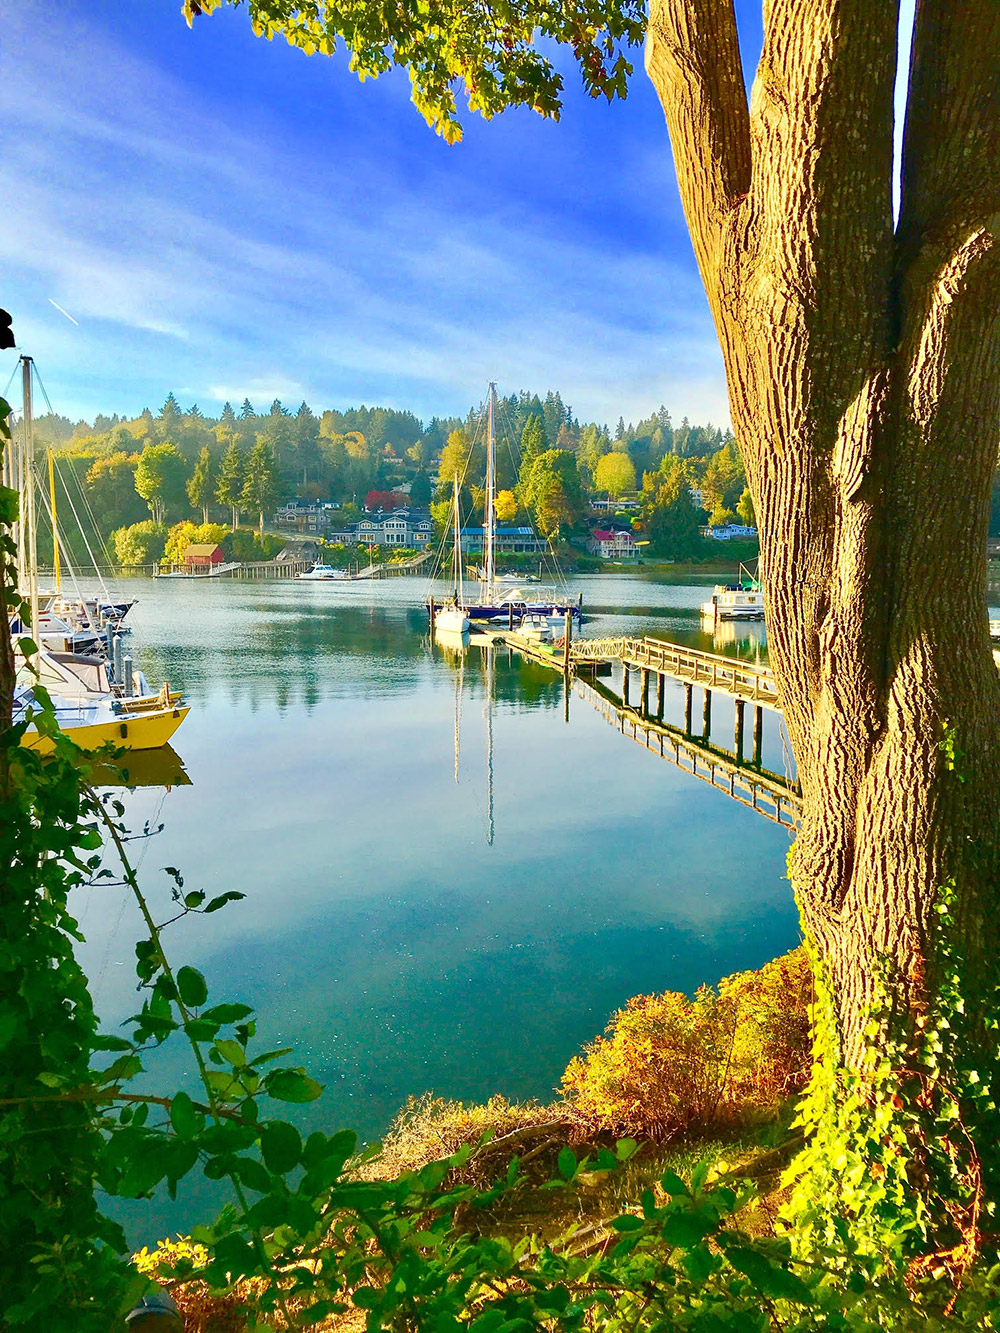 Pam Sproul - Harbor Autumn Colors